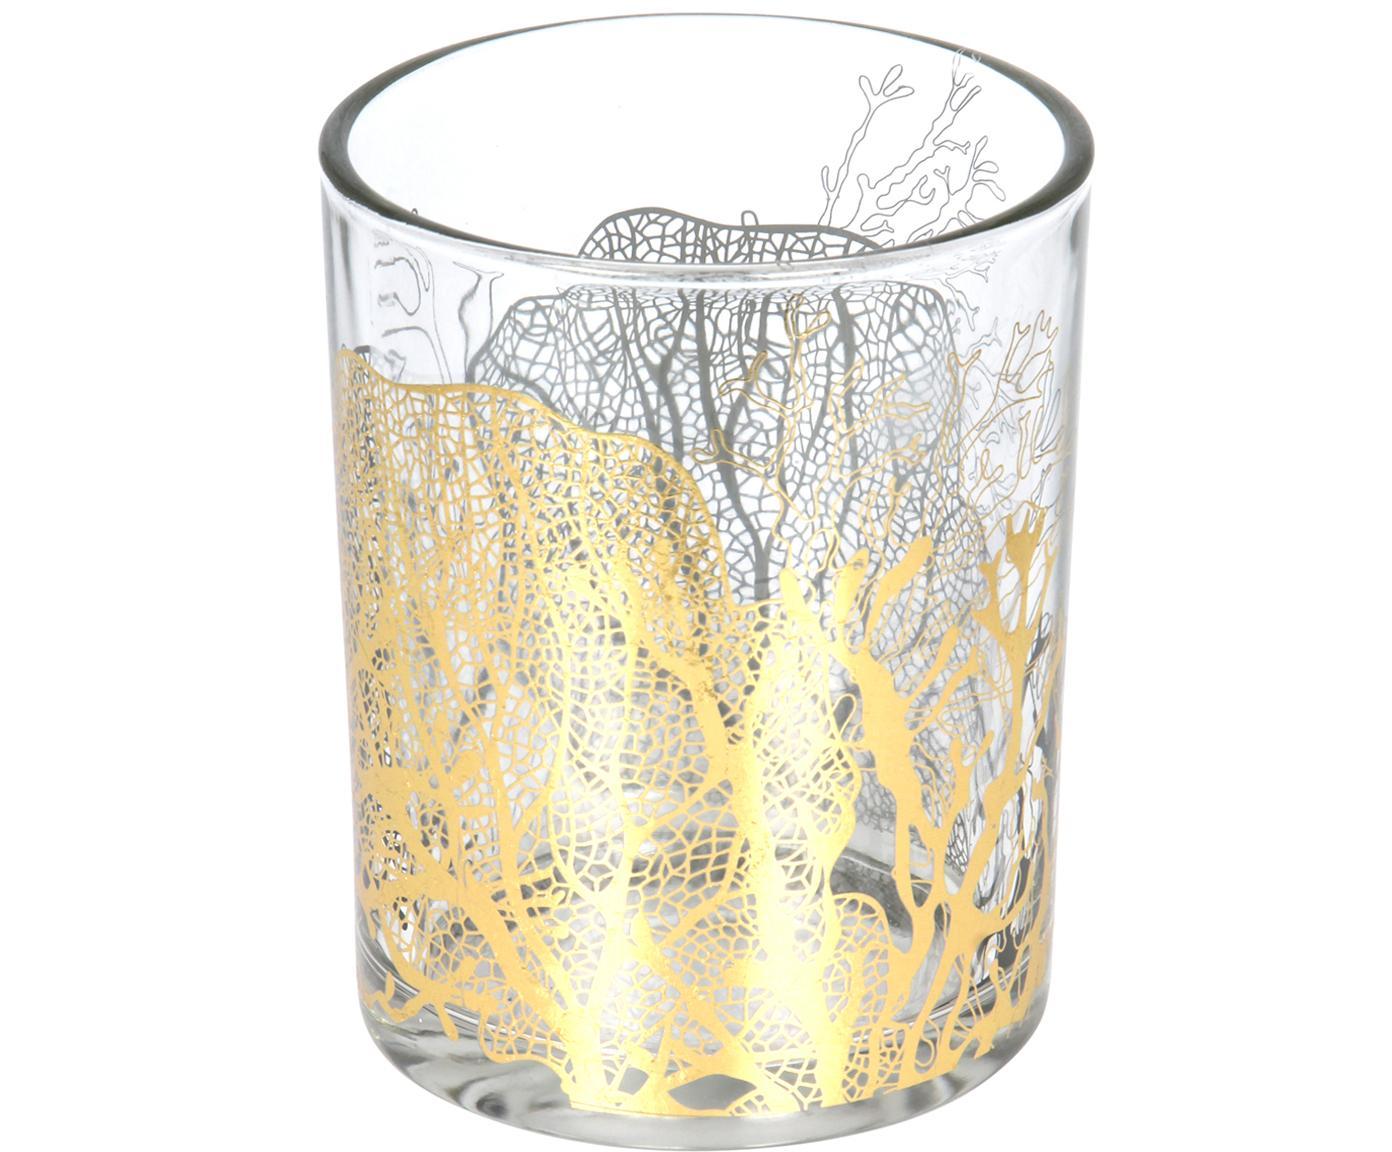 Portalumini Jules, Vetro, Trasparente, dorato, Ø 10 x Alt. 13 cm